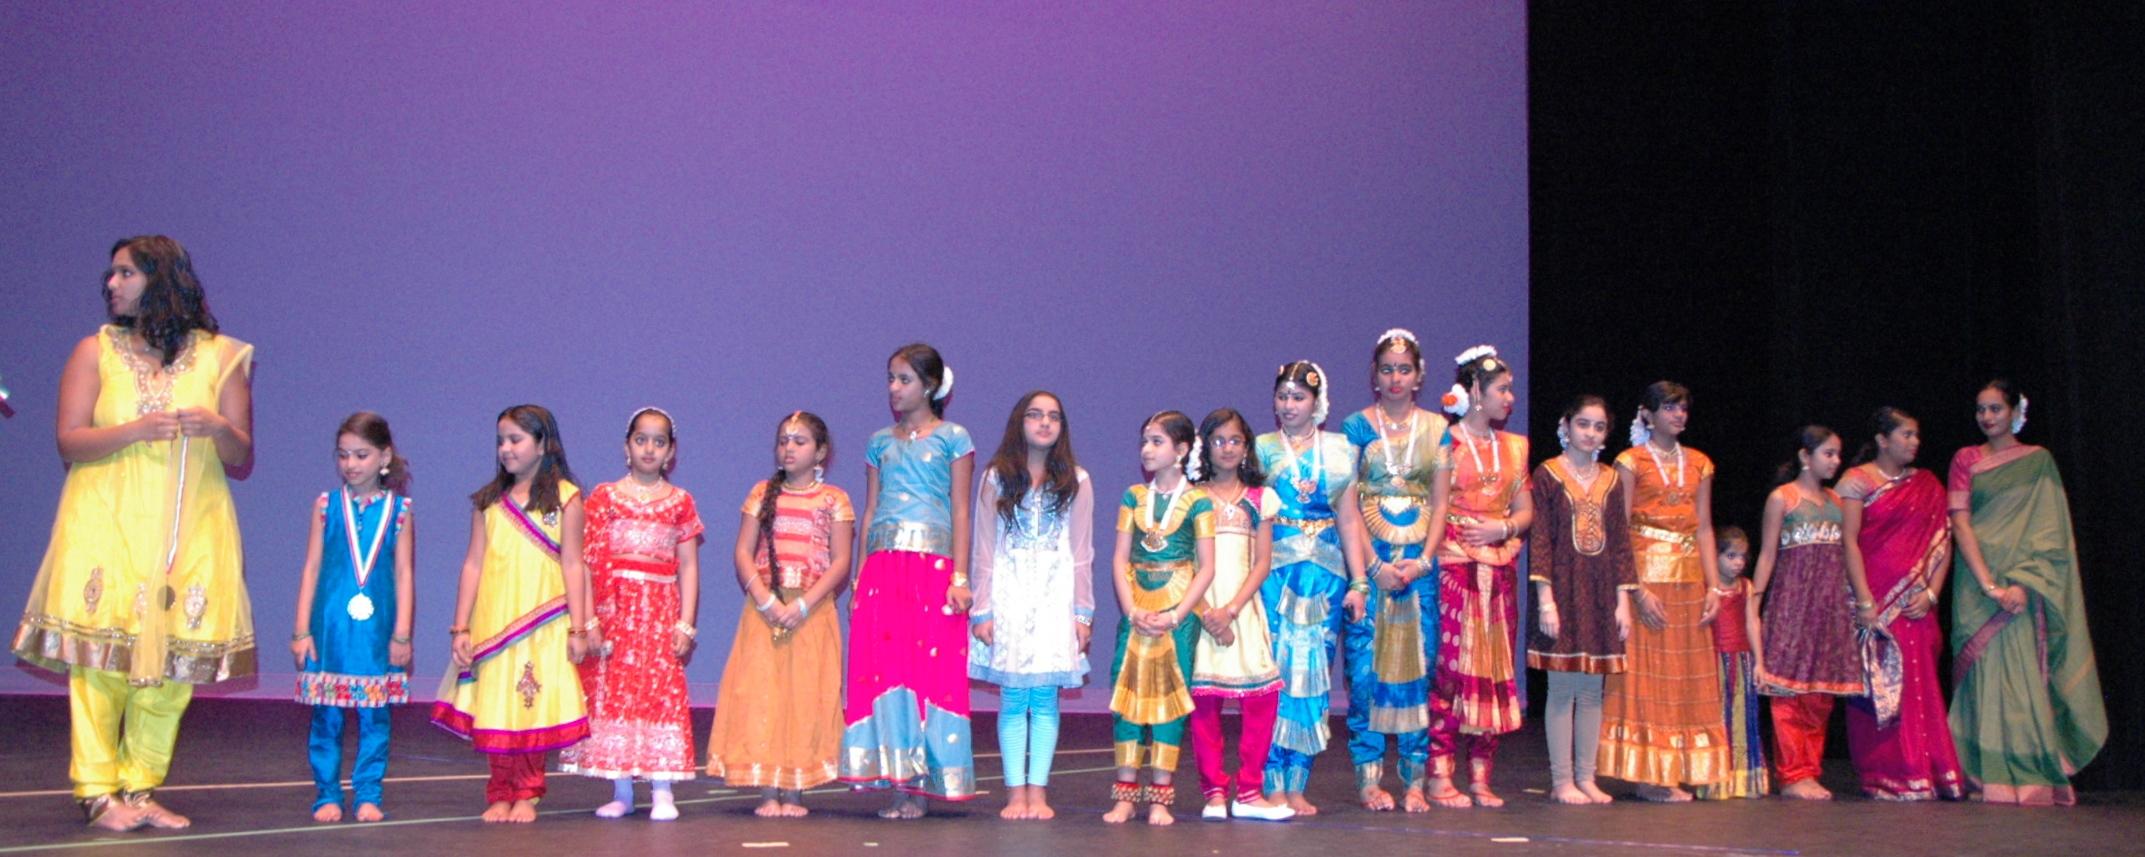 Tamil Cultural Nite festival Waterloo